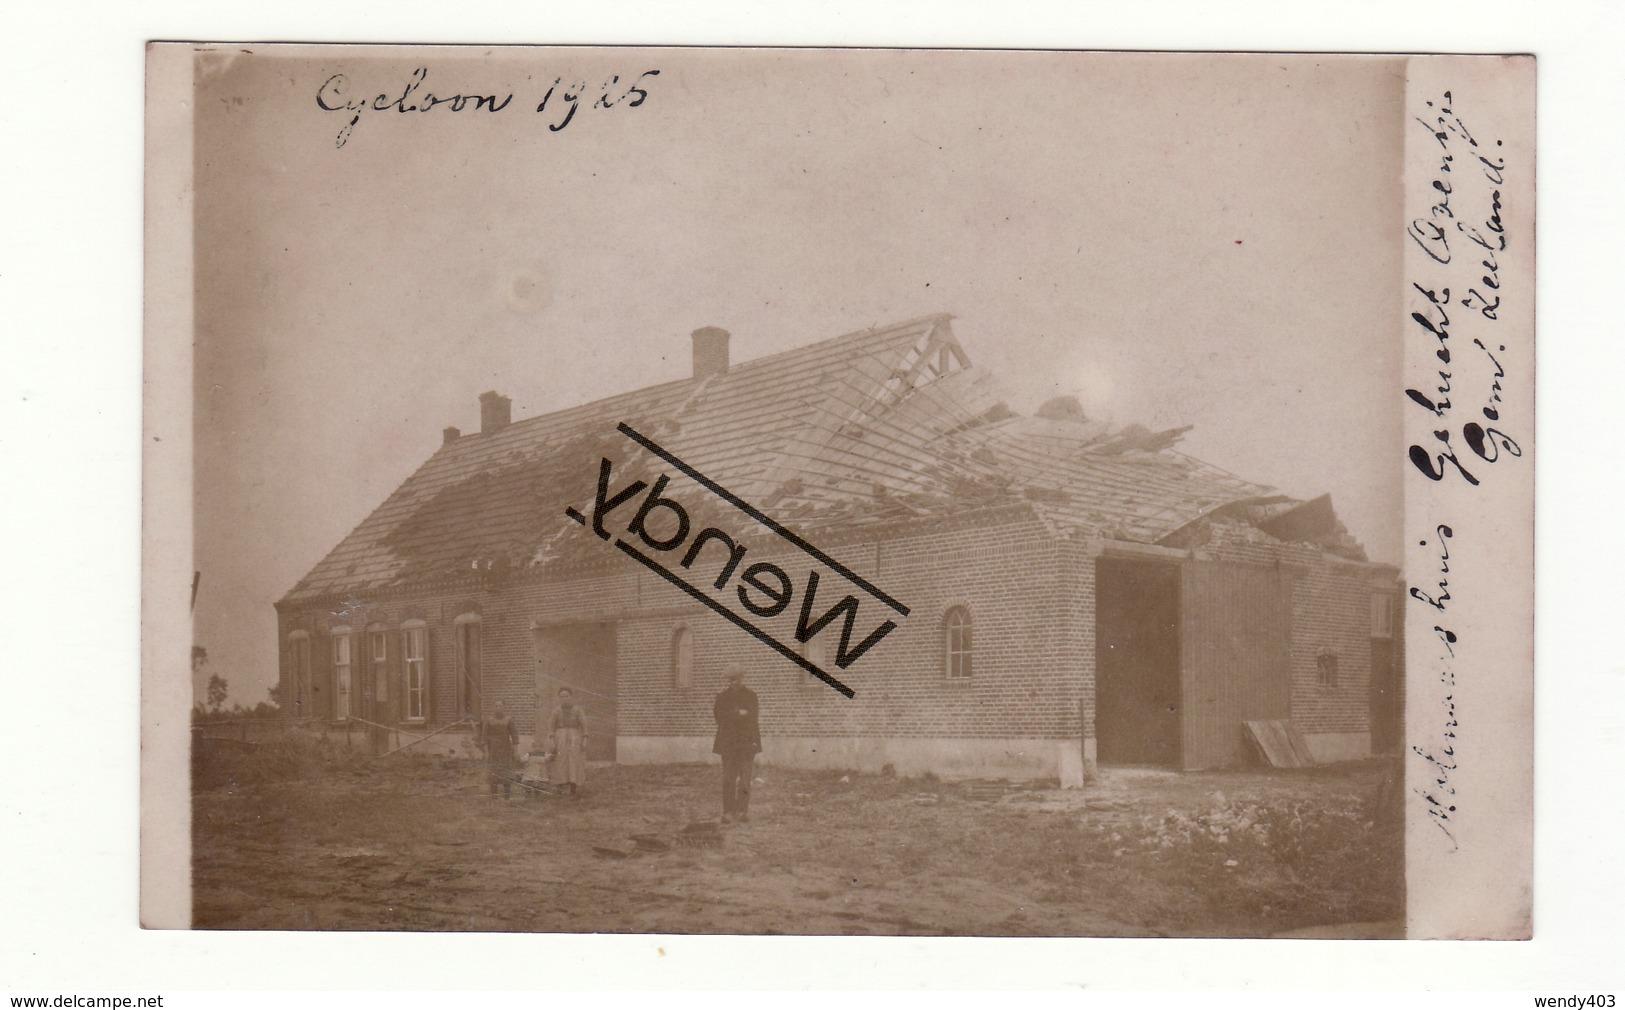 Oventje - Gemeente Zeeland - Molenaarshuis Originele Foto - Cycloon 1925 - Pays-Bas